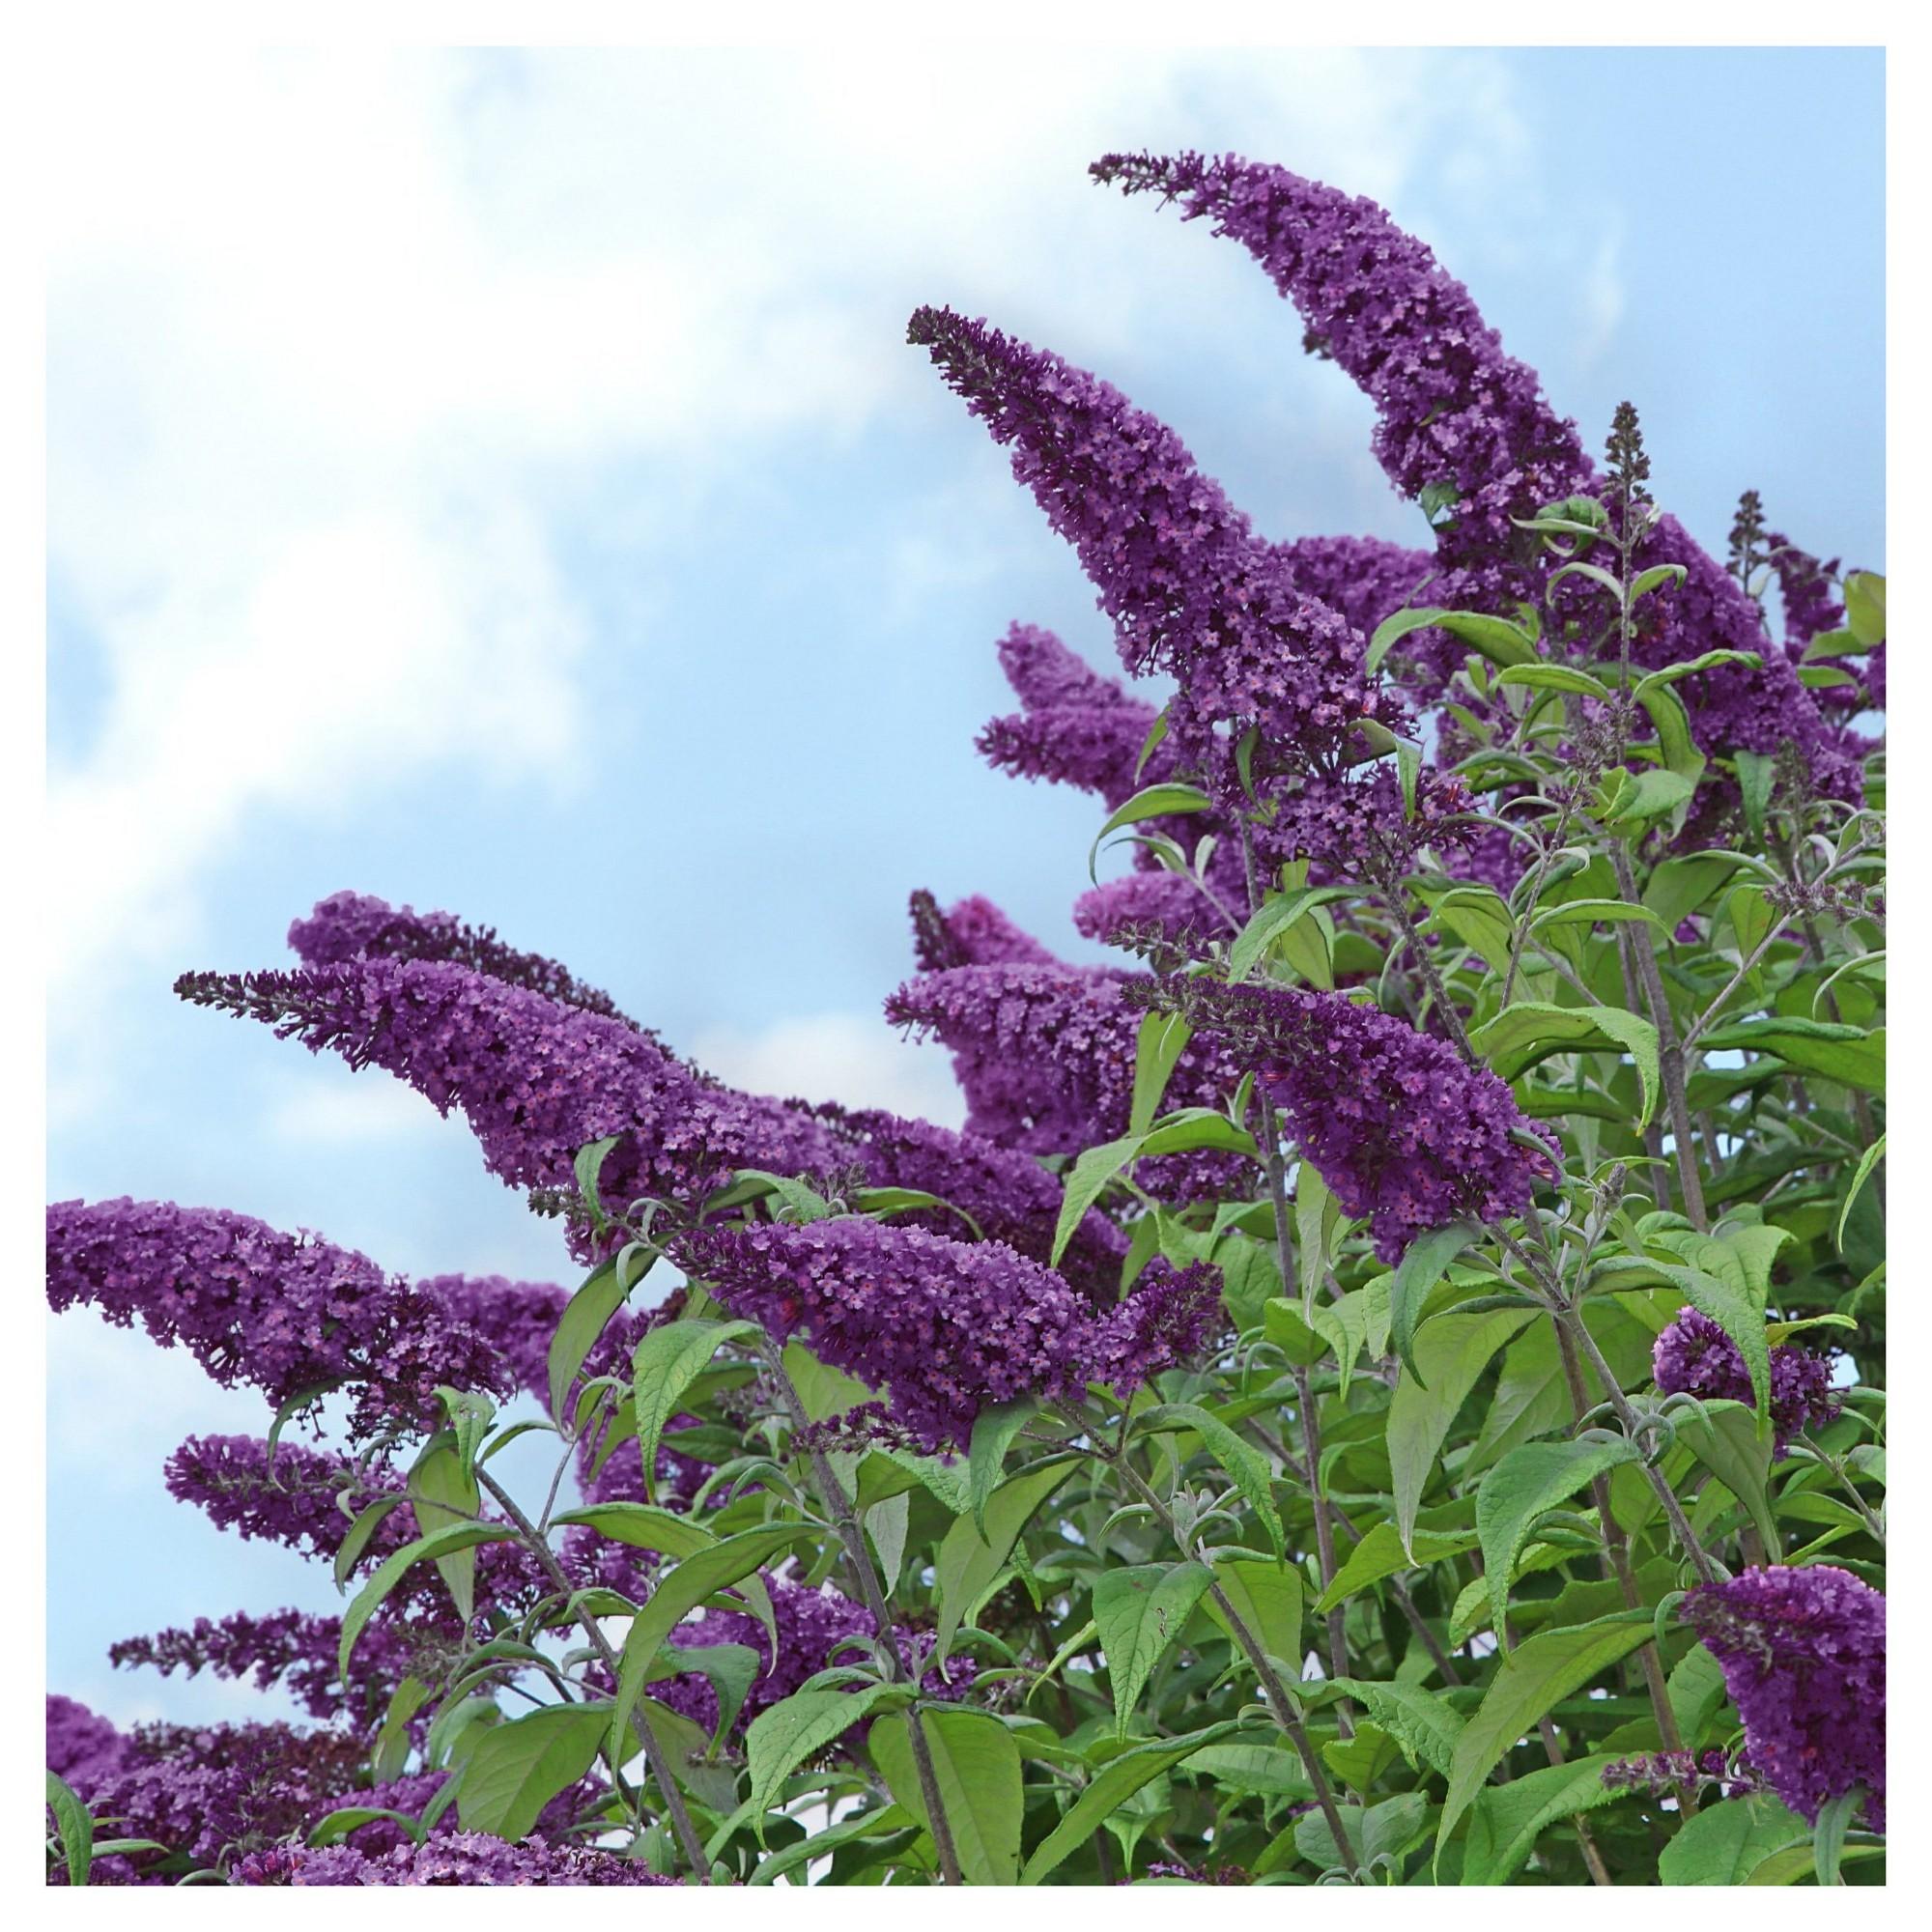 Buddleia Black Knight 1pc Cottage Hill U S D A Hardiness Zone 5 9 Flowering Shrubs White Flowering Shrubs Plants